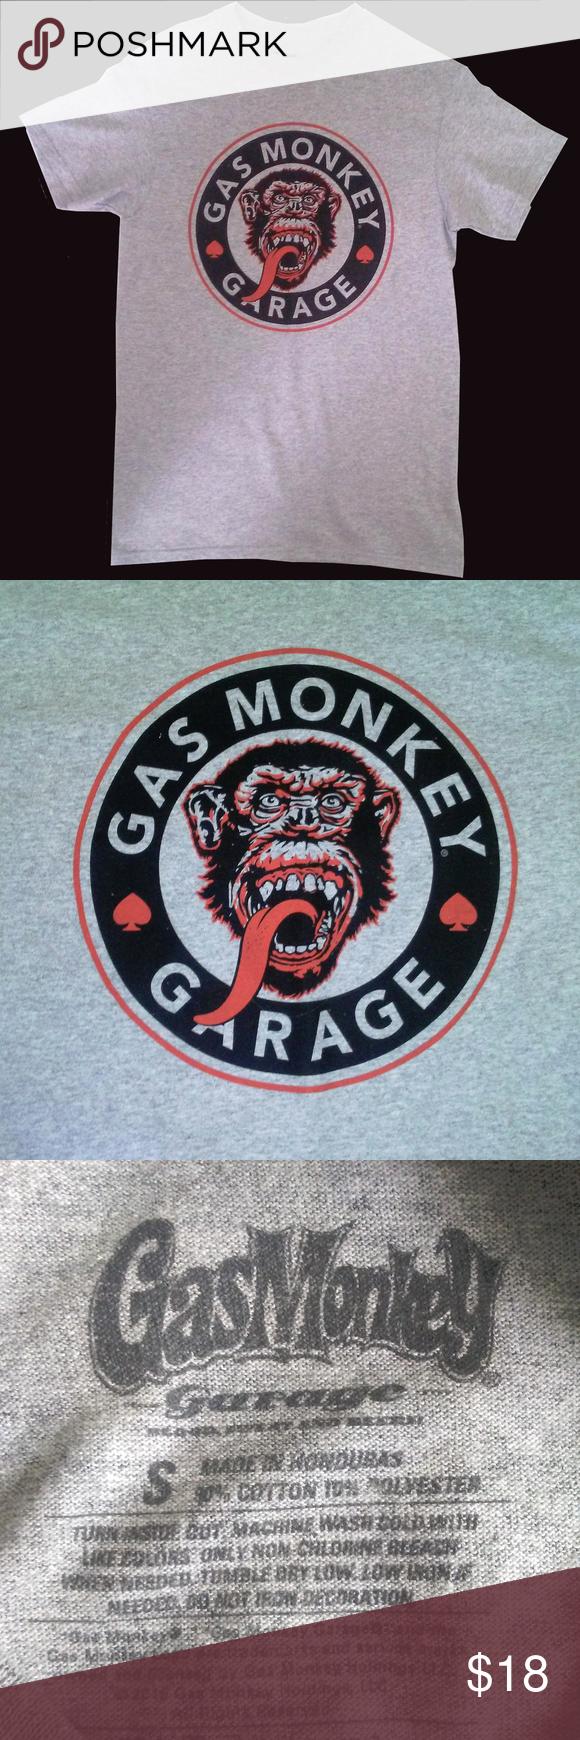 Gas monkey garage t-shirt official #gasmonkeygarage I just added this listing on Poshmark: GAS MONKEY GARAGE  T-SHIRT  OFFICIAL. #shopmycloset #poshmark #fashion #shopping #style #forsale #Gas Monkey Garage #Other #gasmonkeygarage